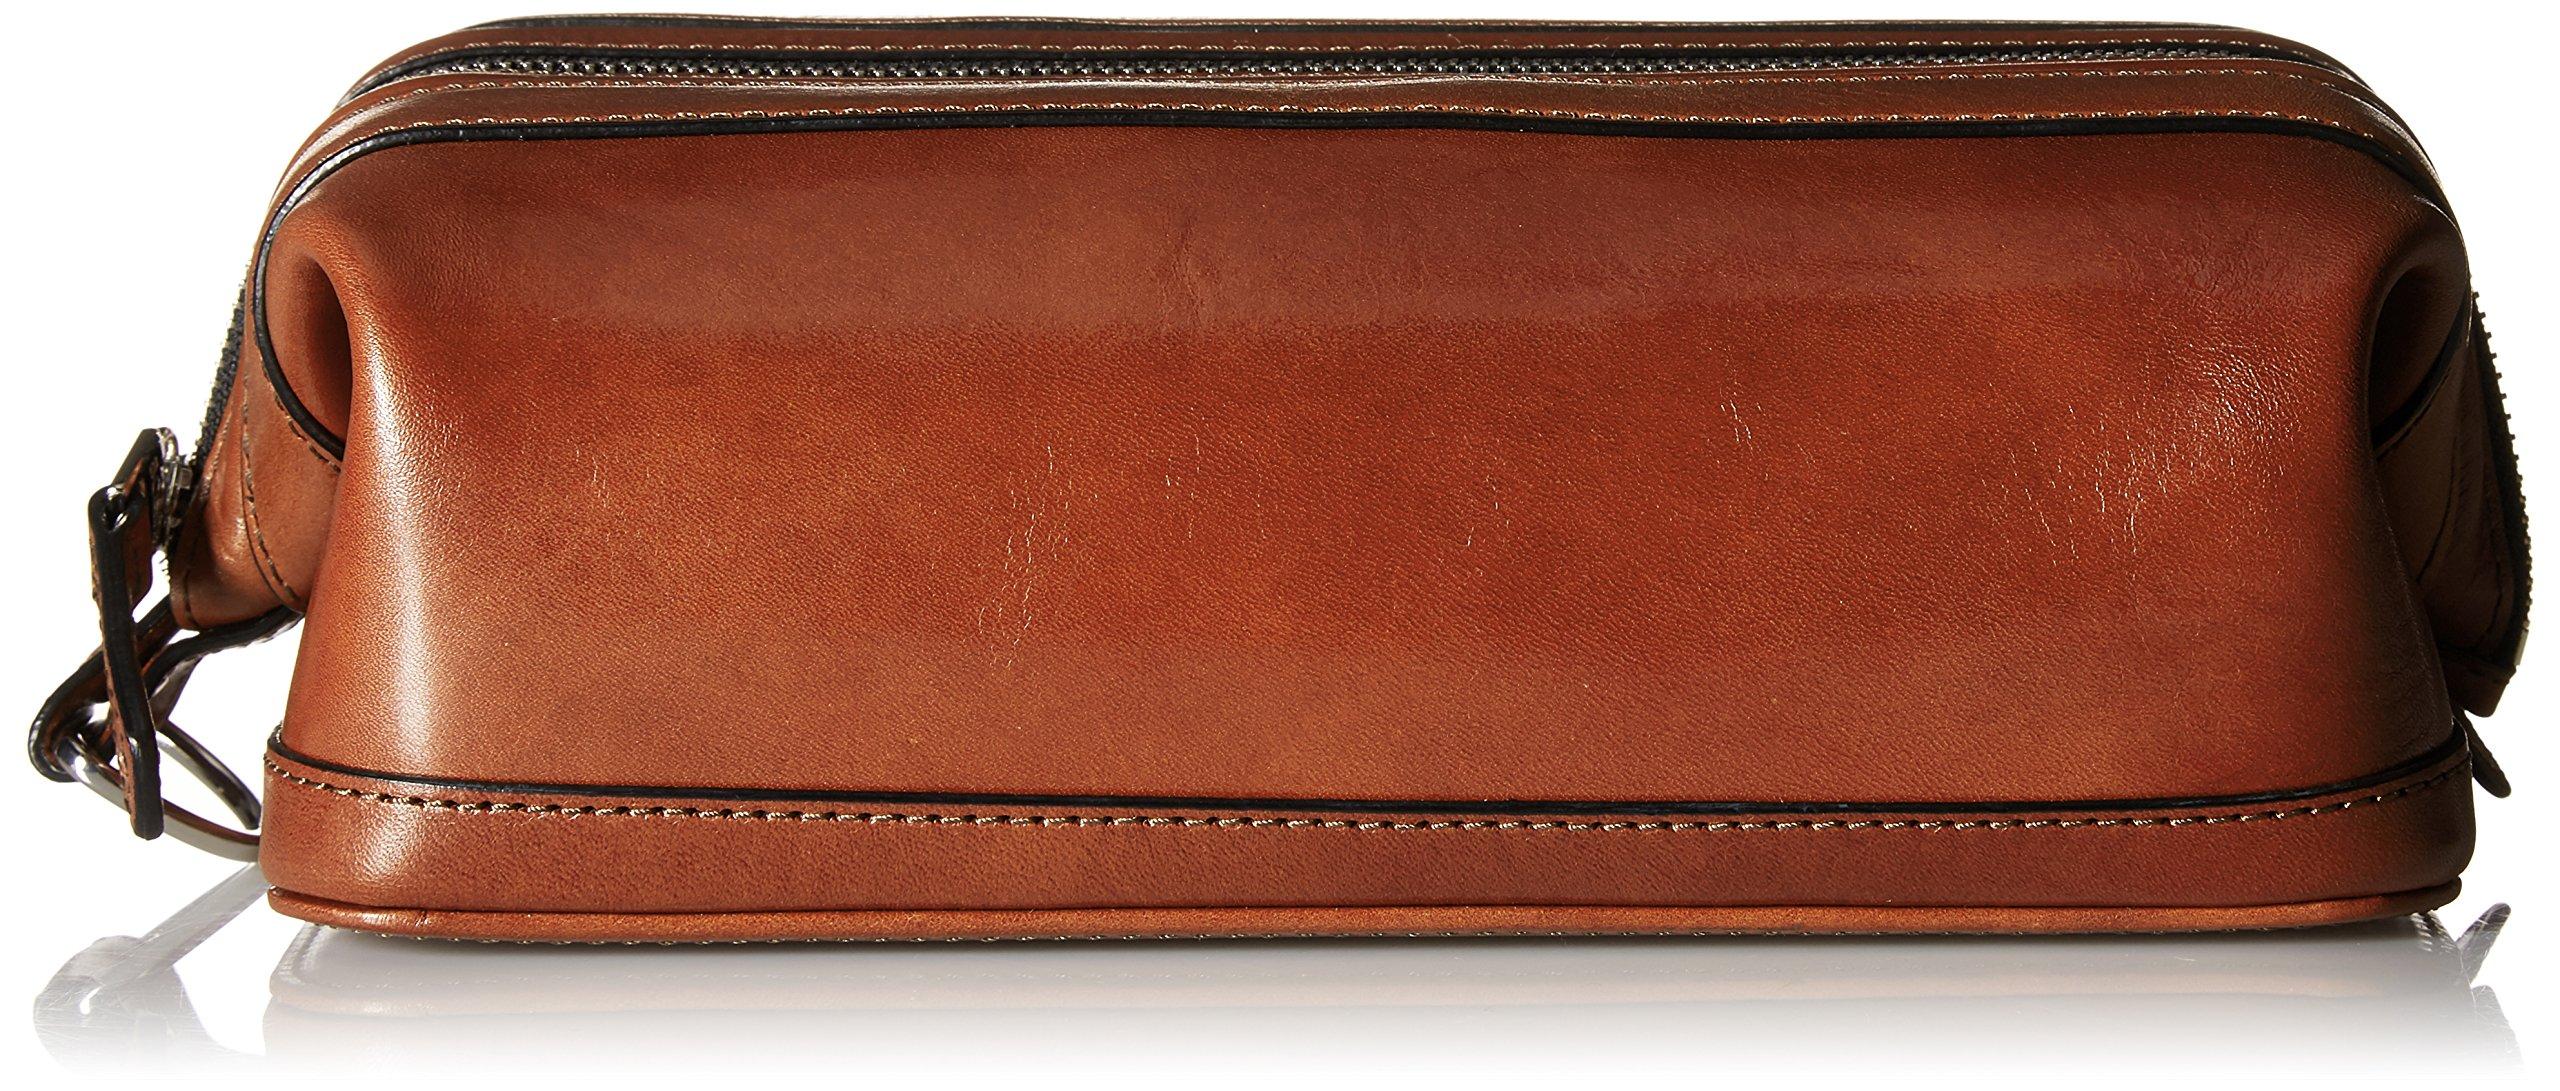 Bosca Old Leather Zipper Utility Kit (Cognac)